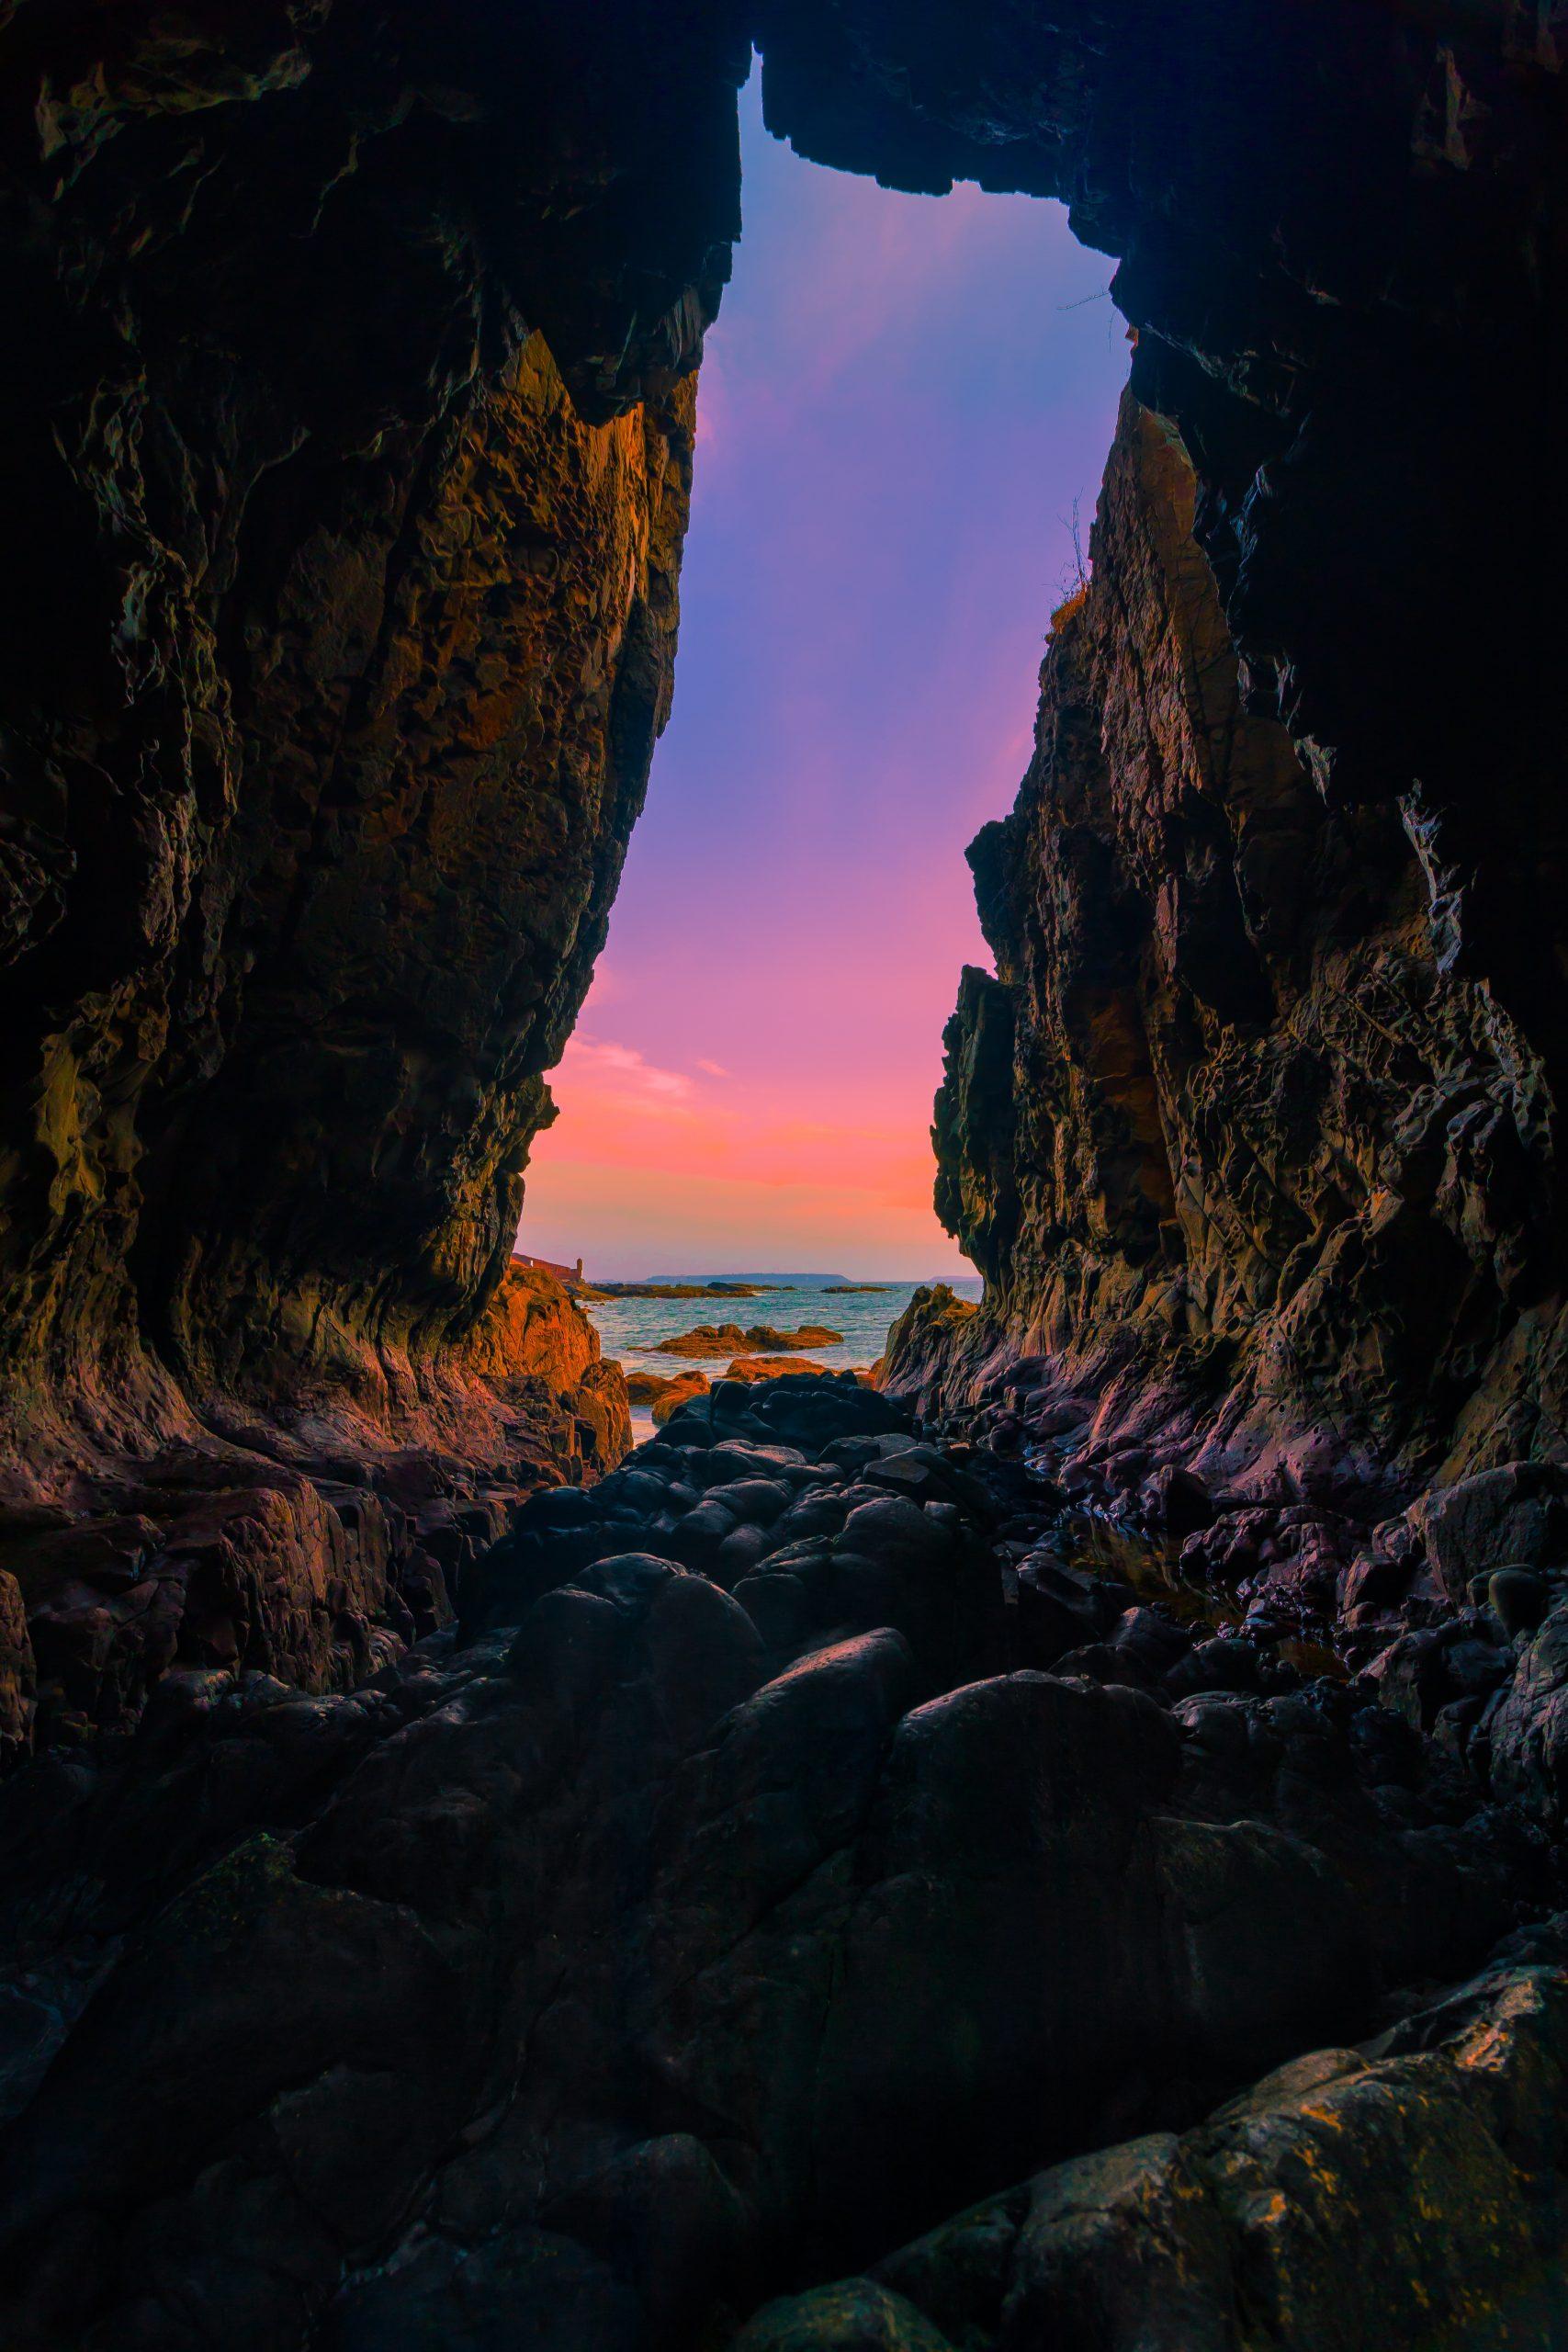 entry to a beach through a cave